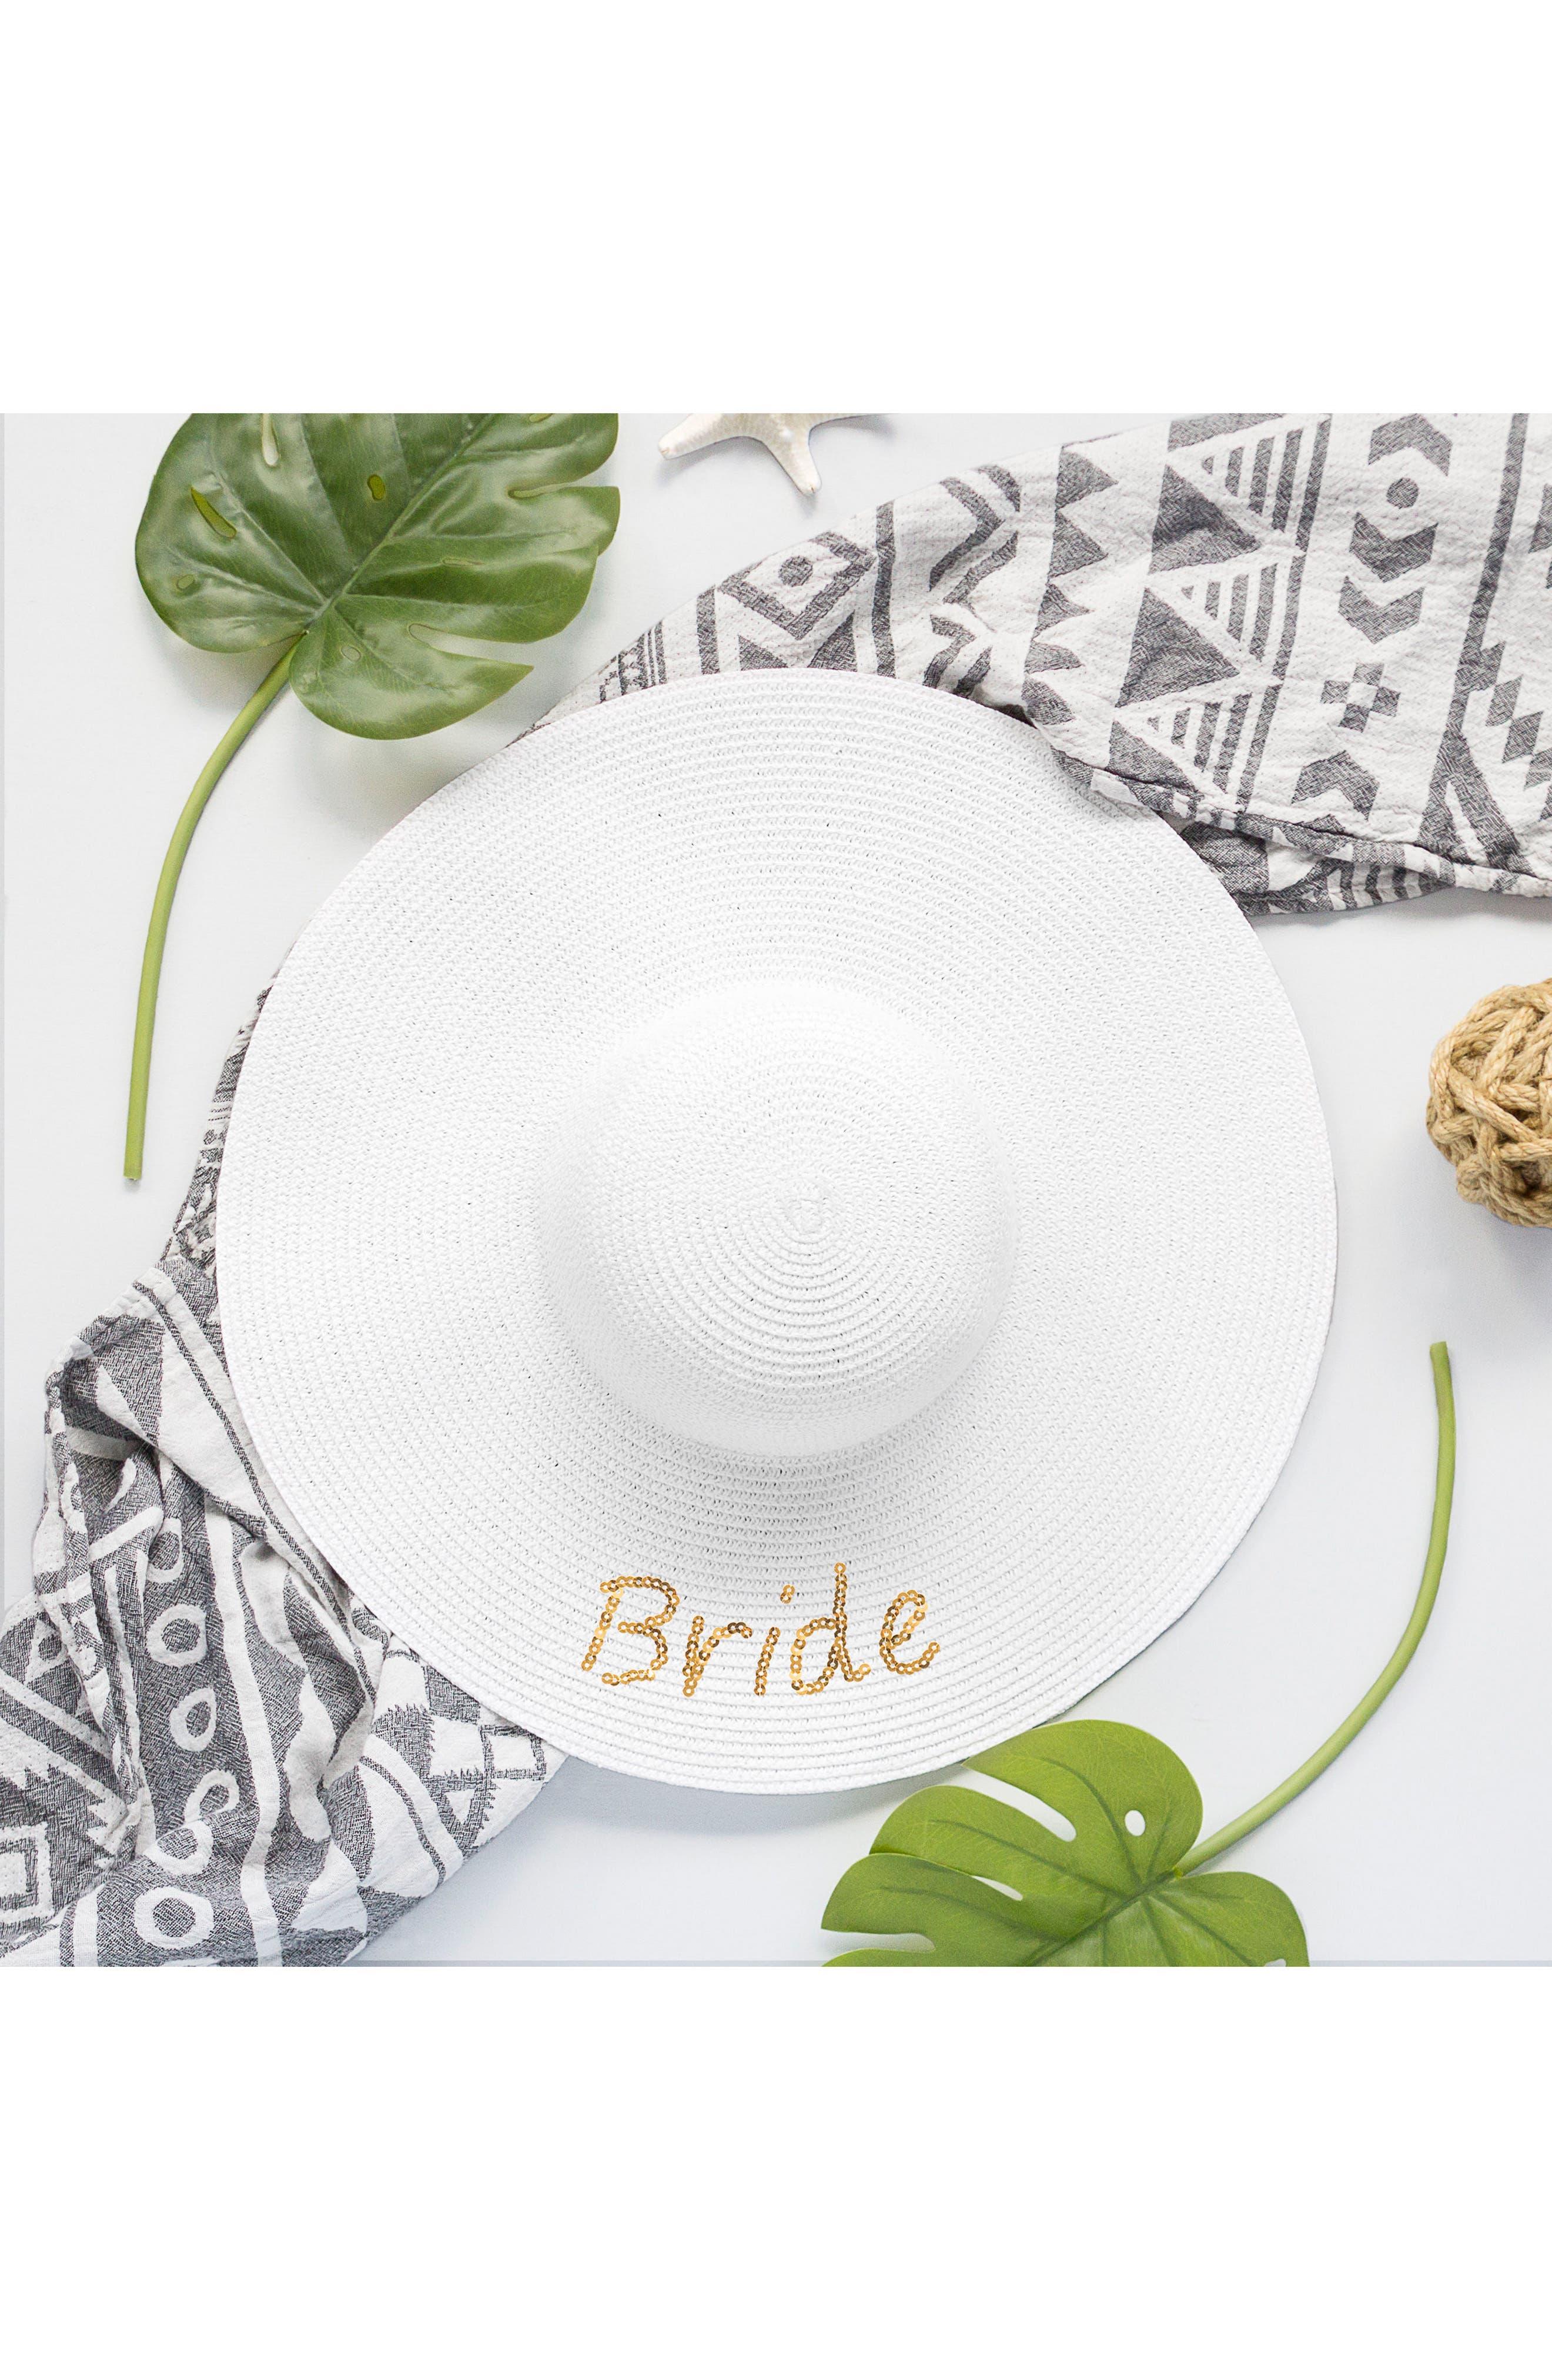 Bride Sequin Straw Hat,                             Alternate thumbnail 4, color,                             Gold